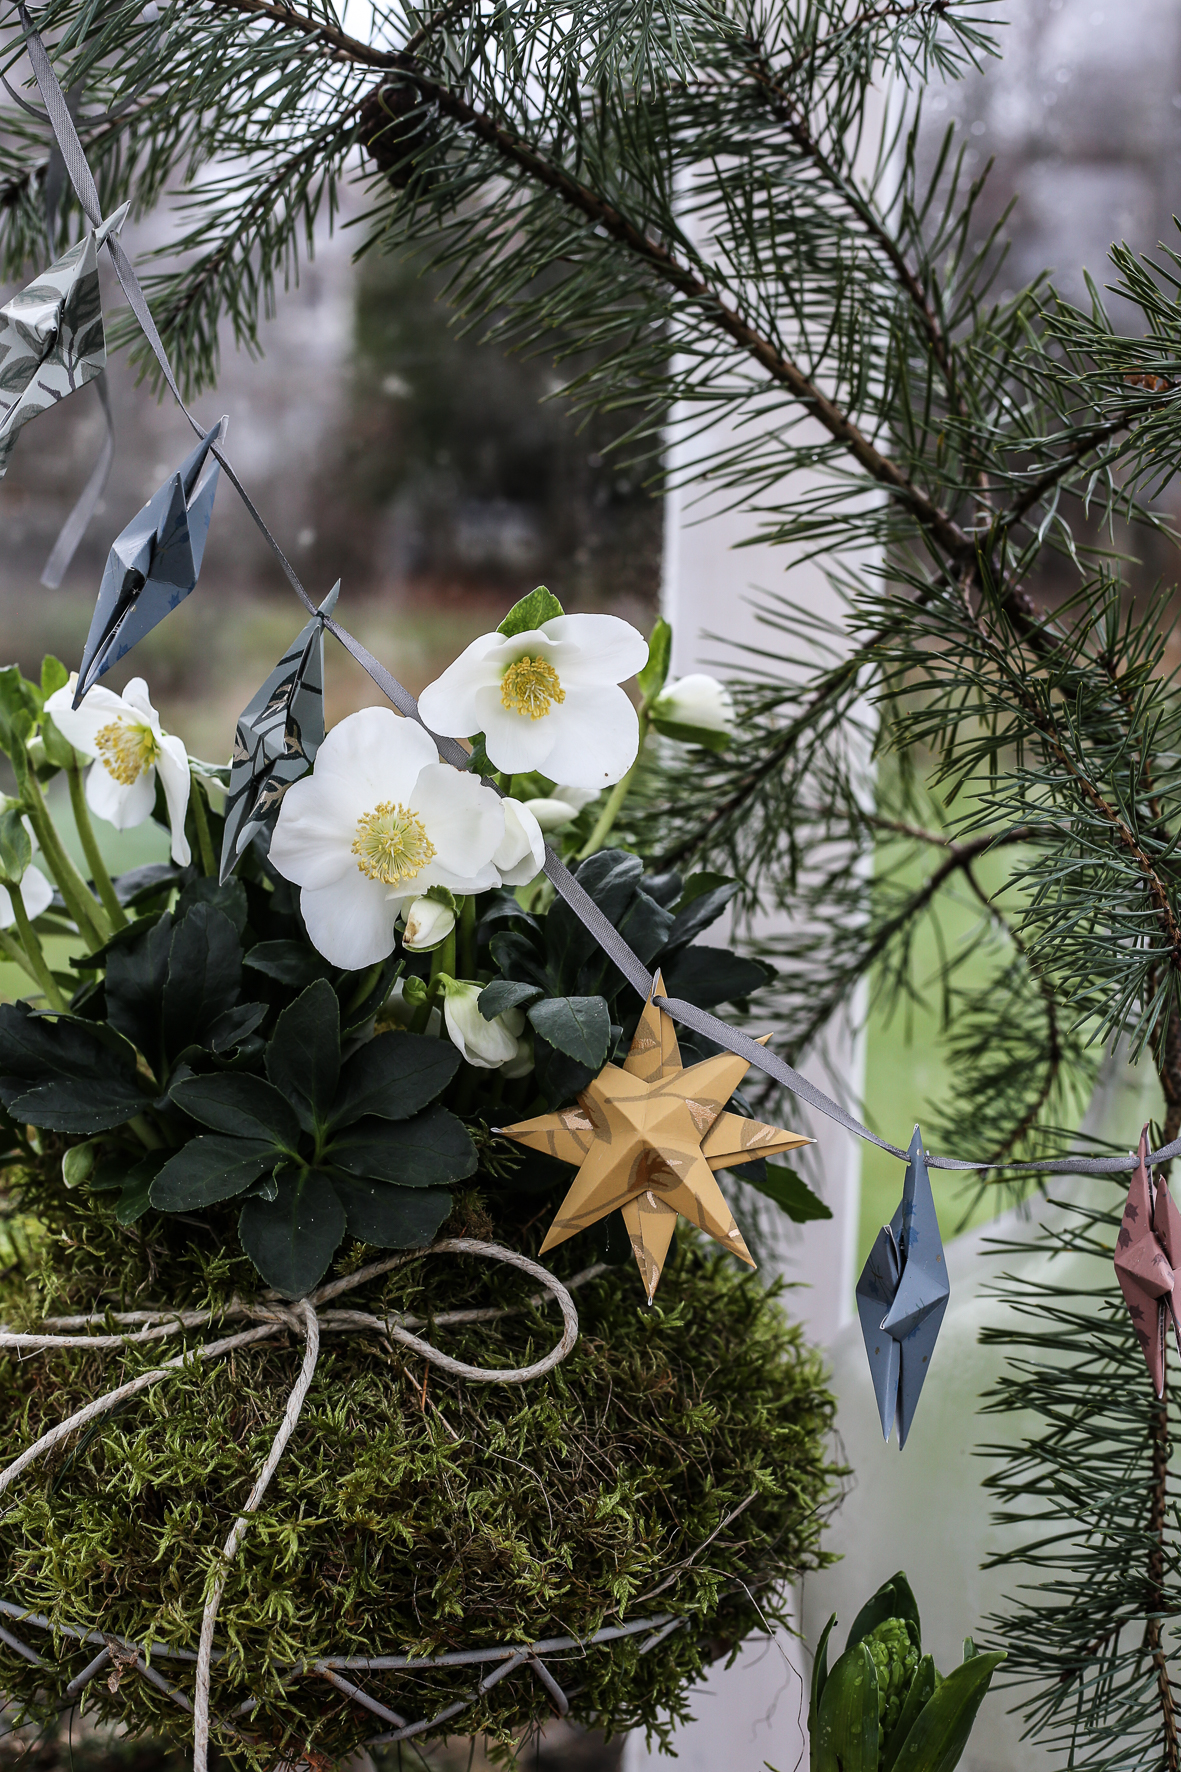 Christmas_star_HannaWendelbo-17.jpg